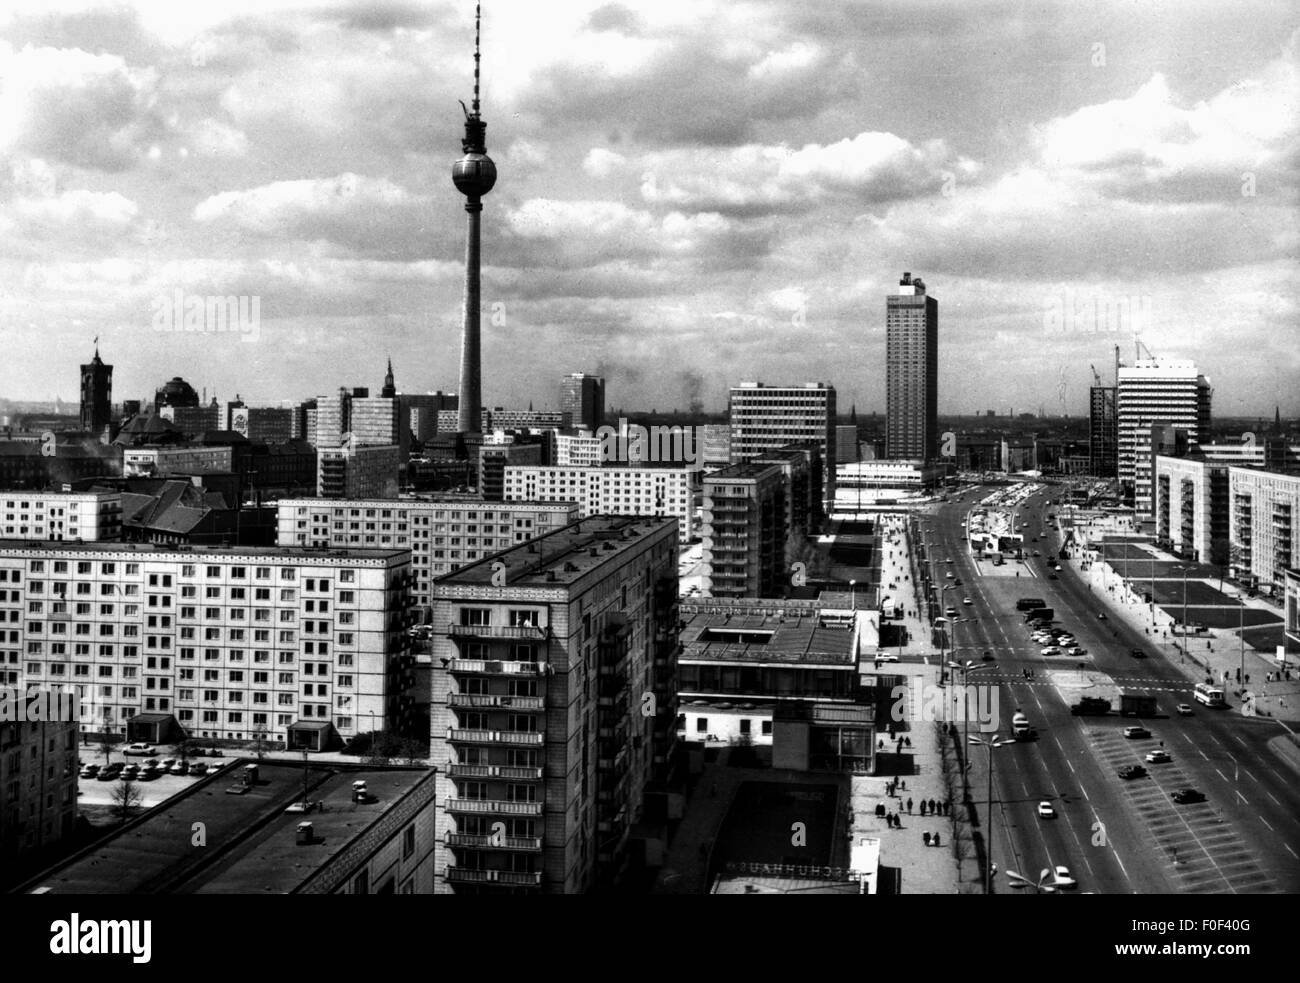 Berlin 1970